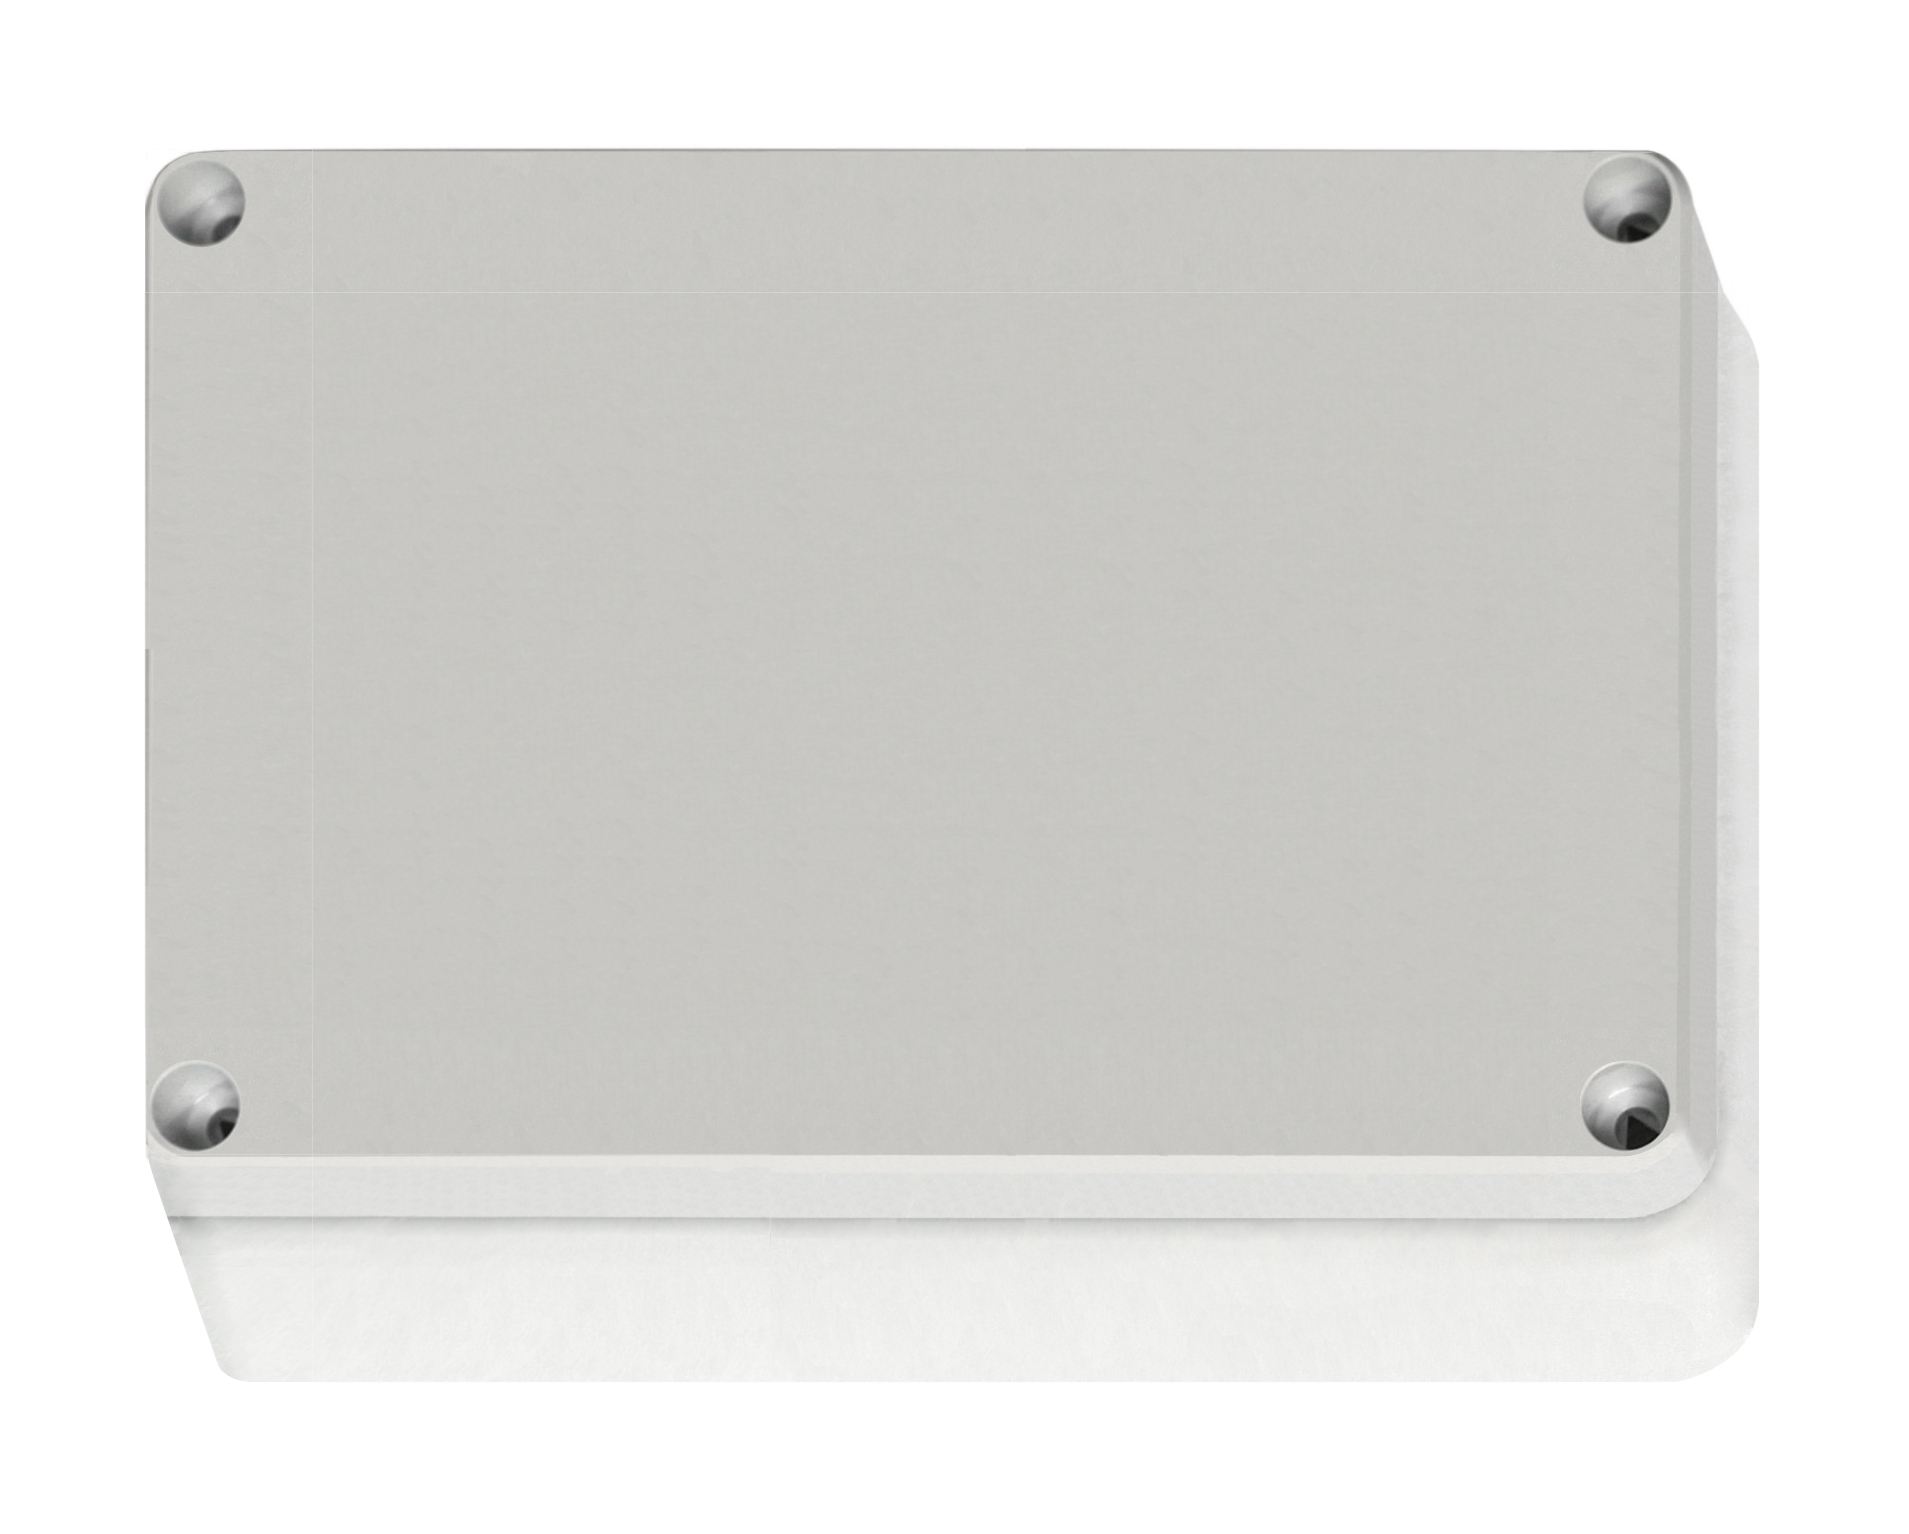 1 Stk ABS Gehäuse mit Deckel grau, 187x122x90mm, RAL7035 IG707004--